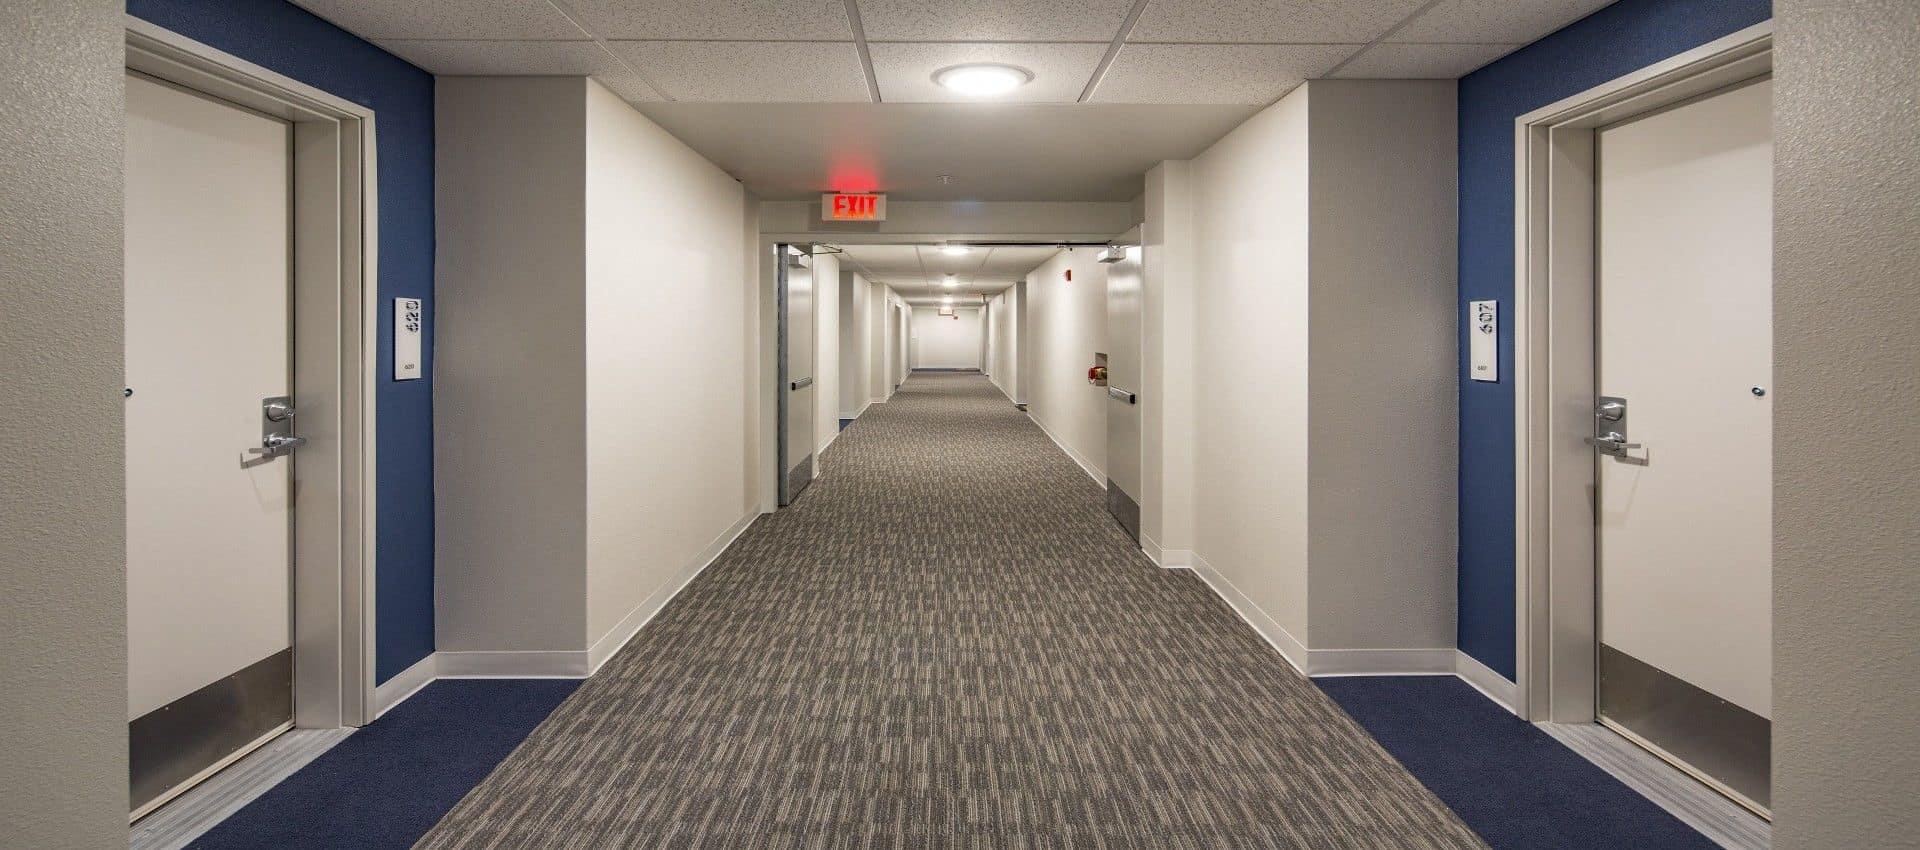 Hallway entrances at EVIVA Midtown